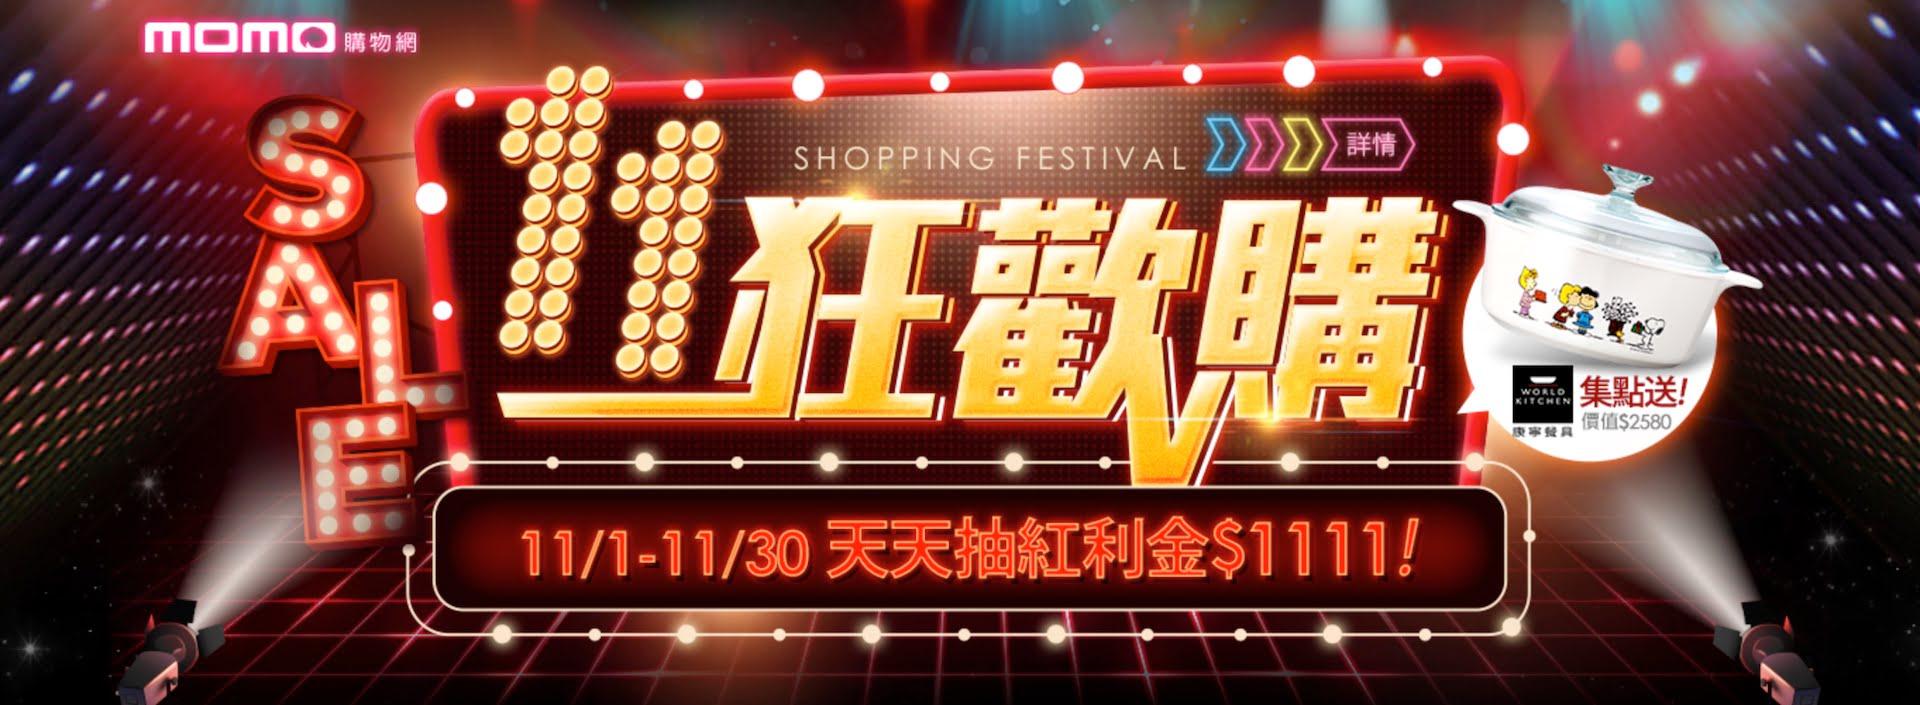 MOMO購物網/11月狂歡購促銷活動(快速集點、點數換禮、熱門好康三大優惠)